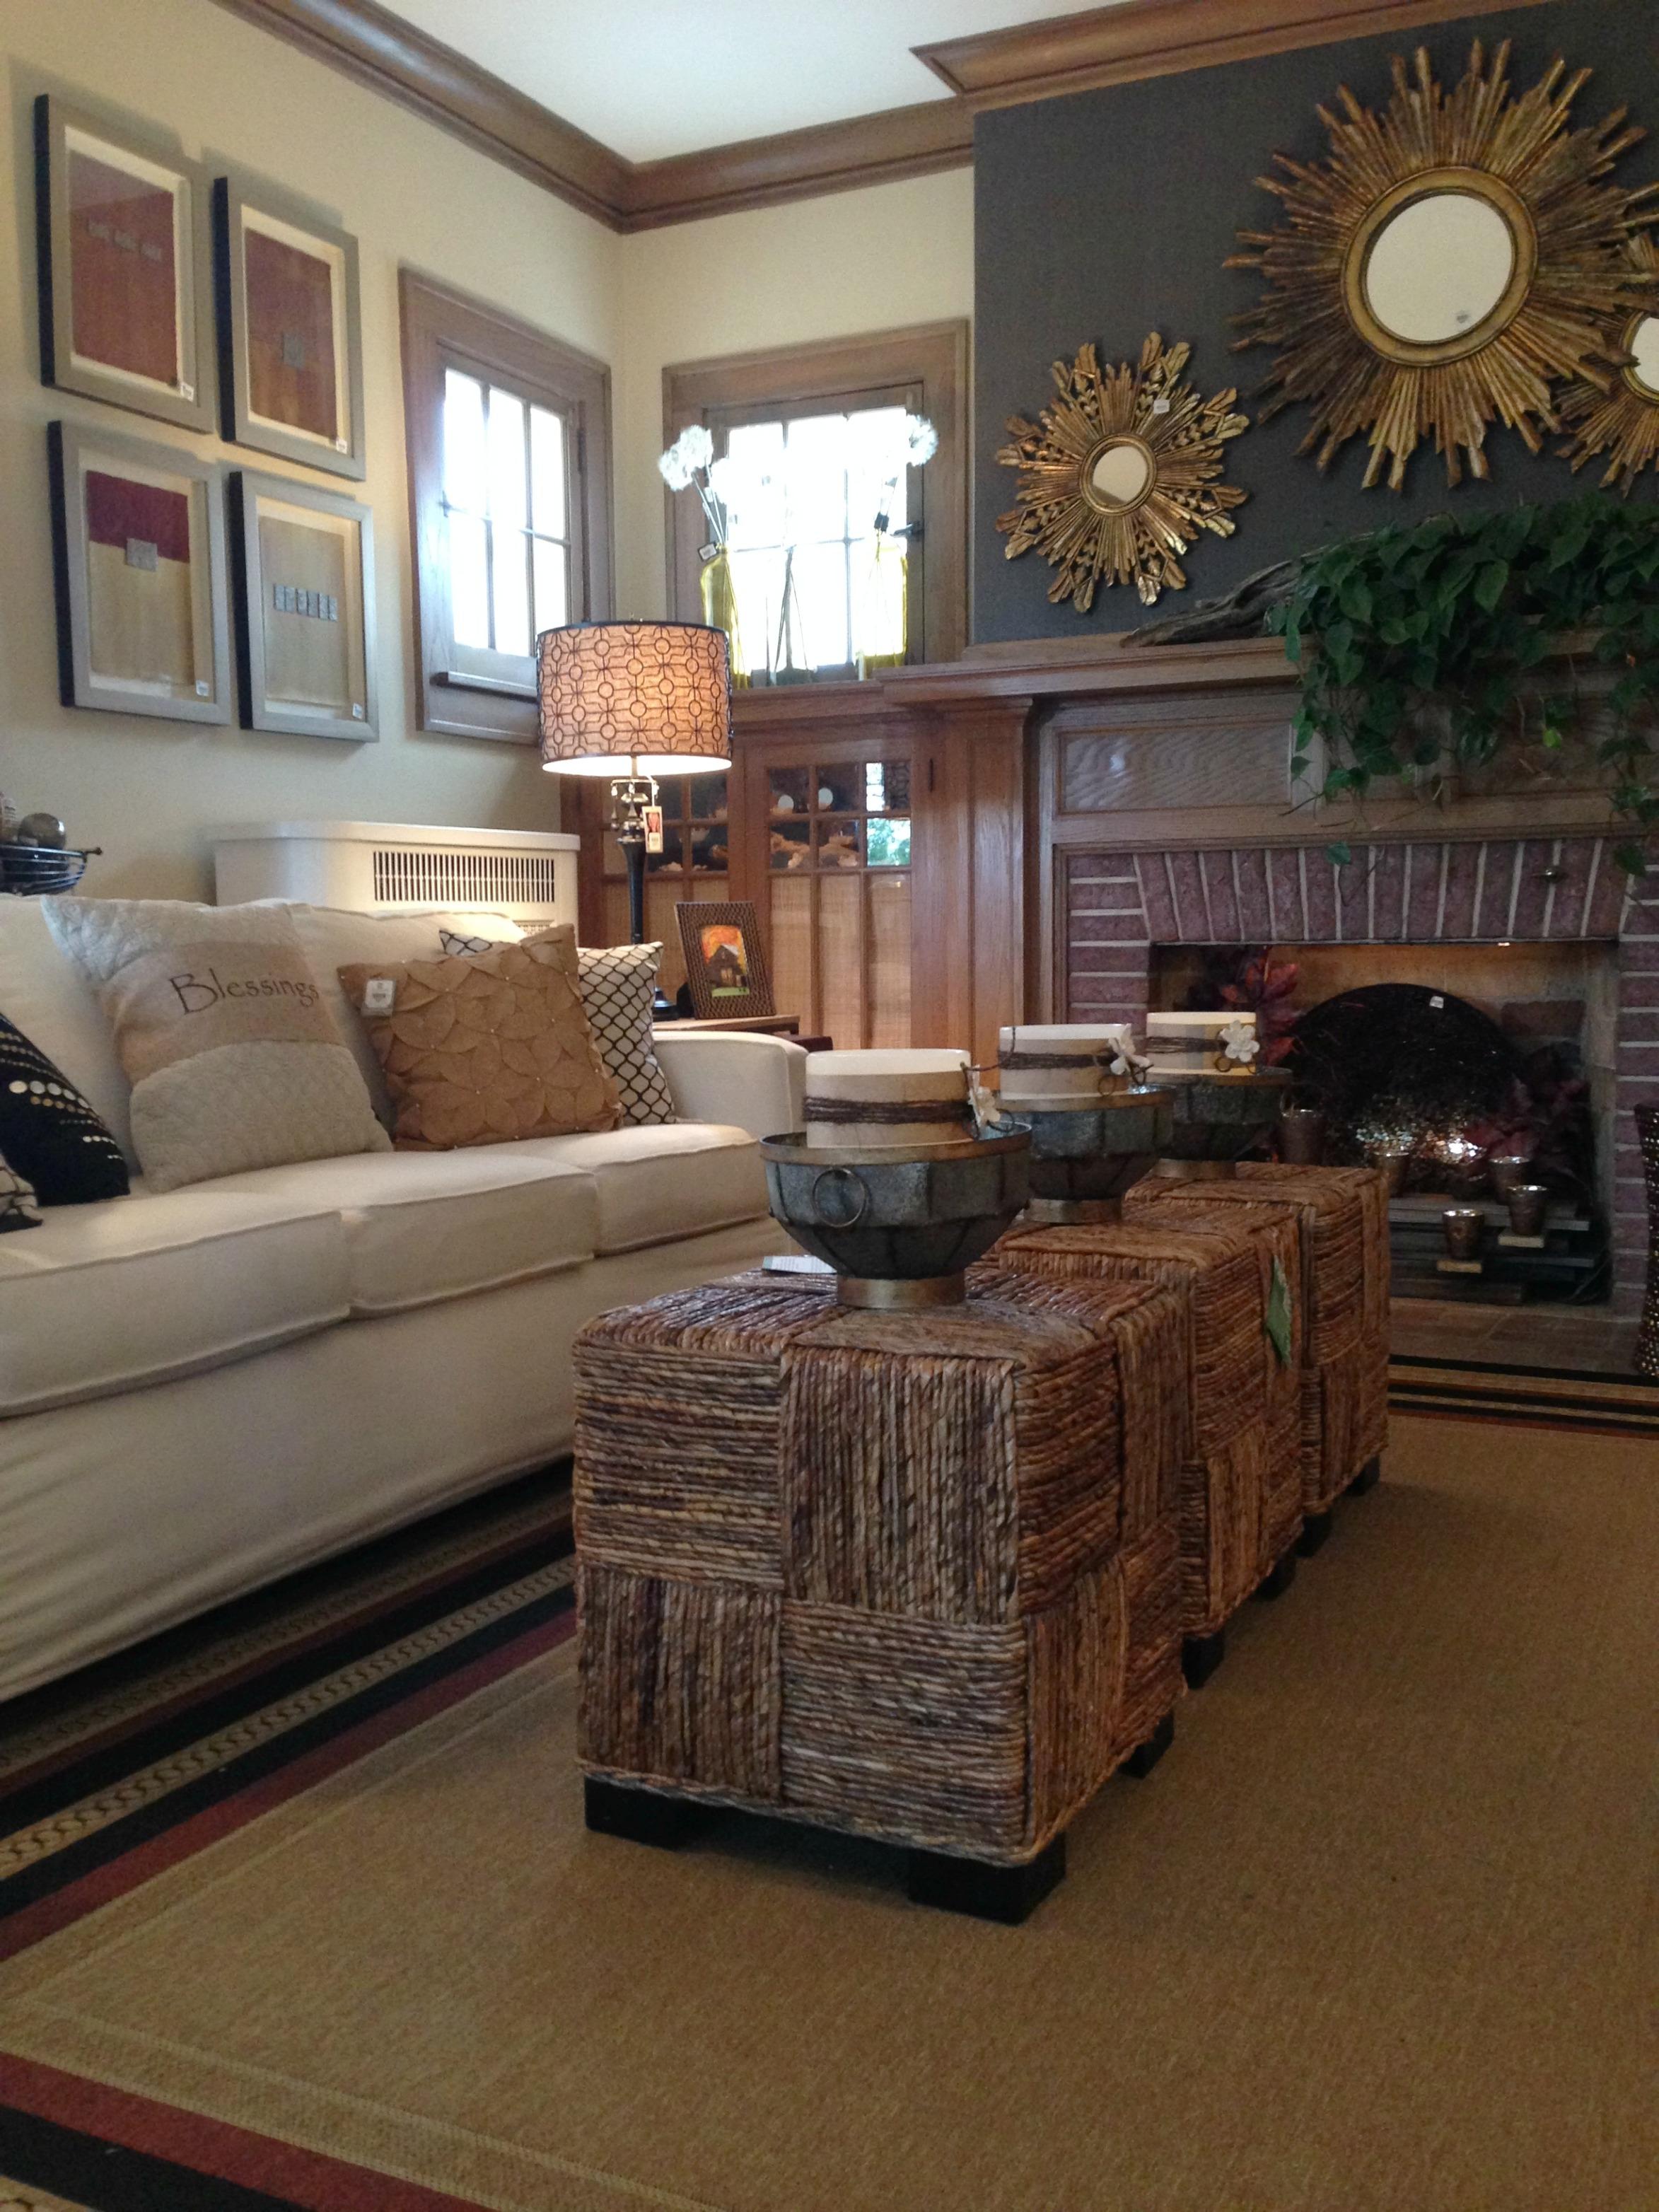 Living Room Designs 2014: Fall Ideas House 2014